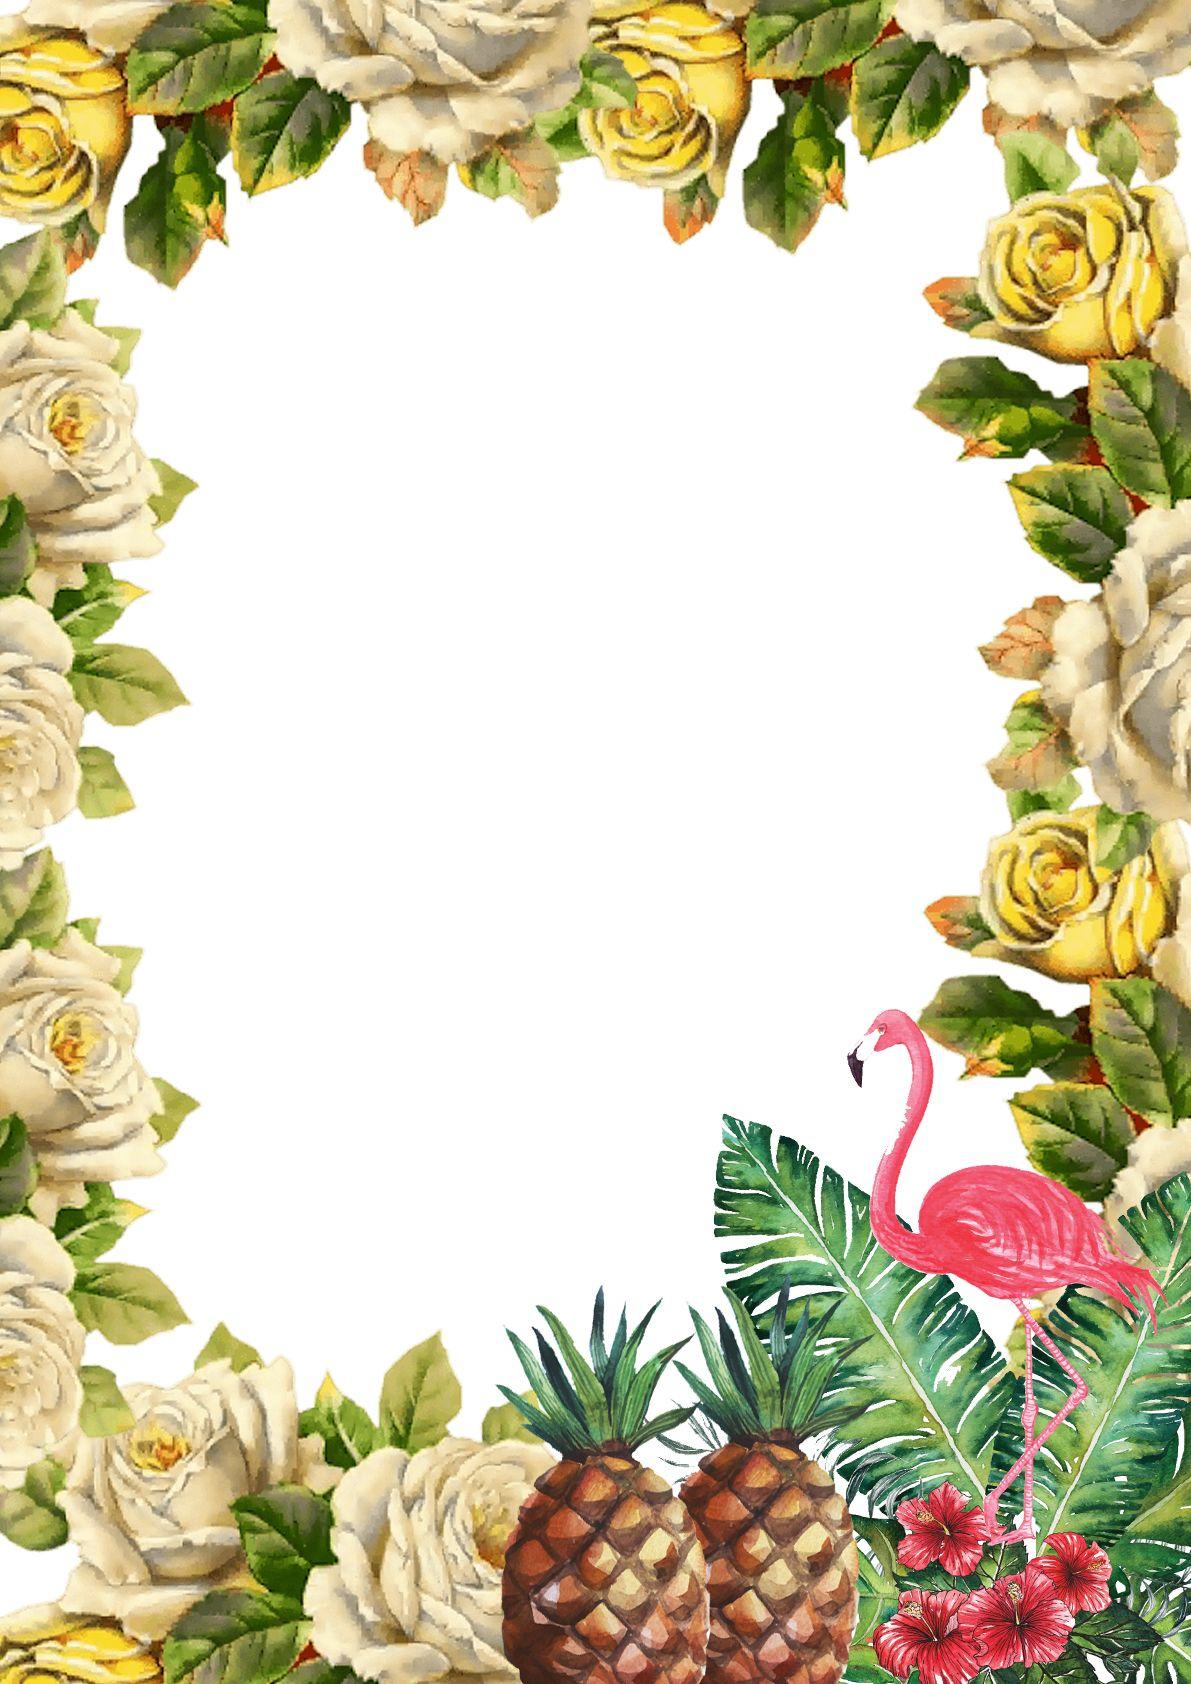 template convite festa havaiana bday pinterest tropical arri re plans iphone et transfert. Black Bedroom Furniture Sets. Home Design Ideas